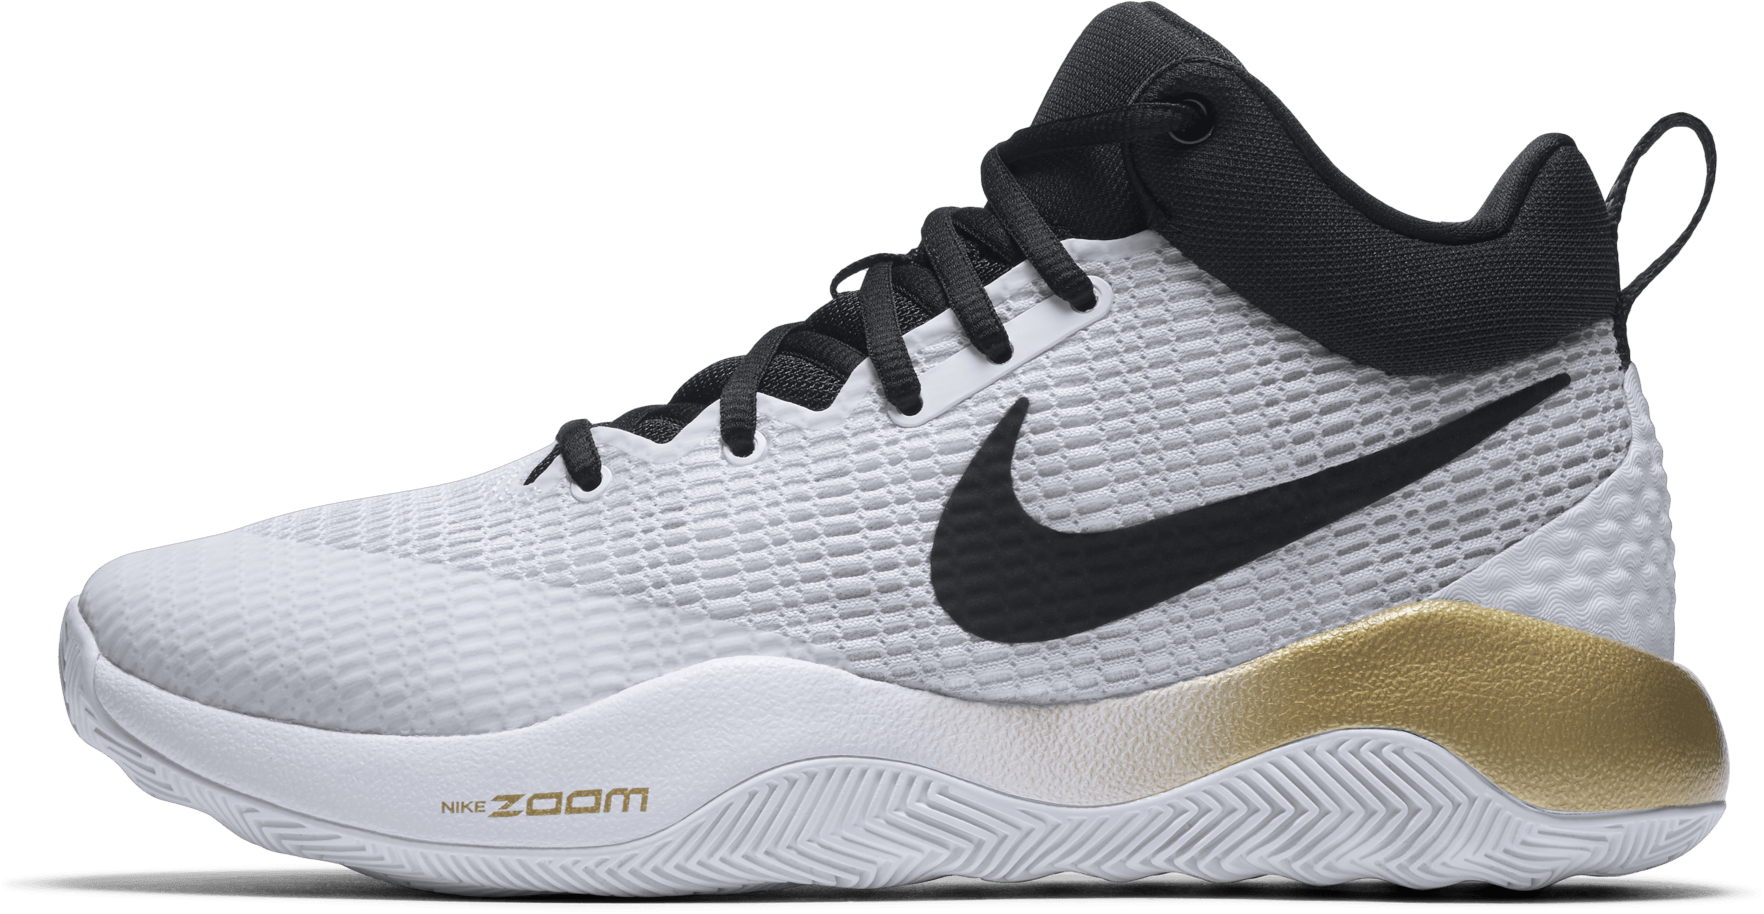 Nike Zoom Rev 17 Performance Review